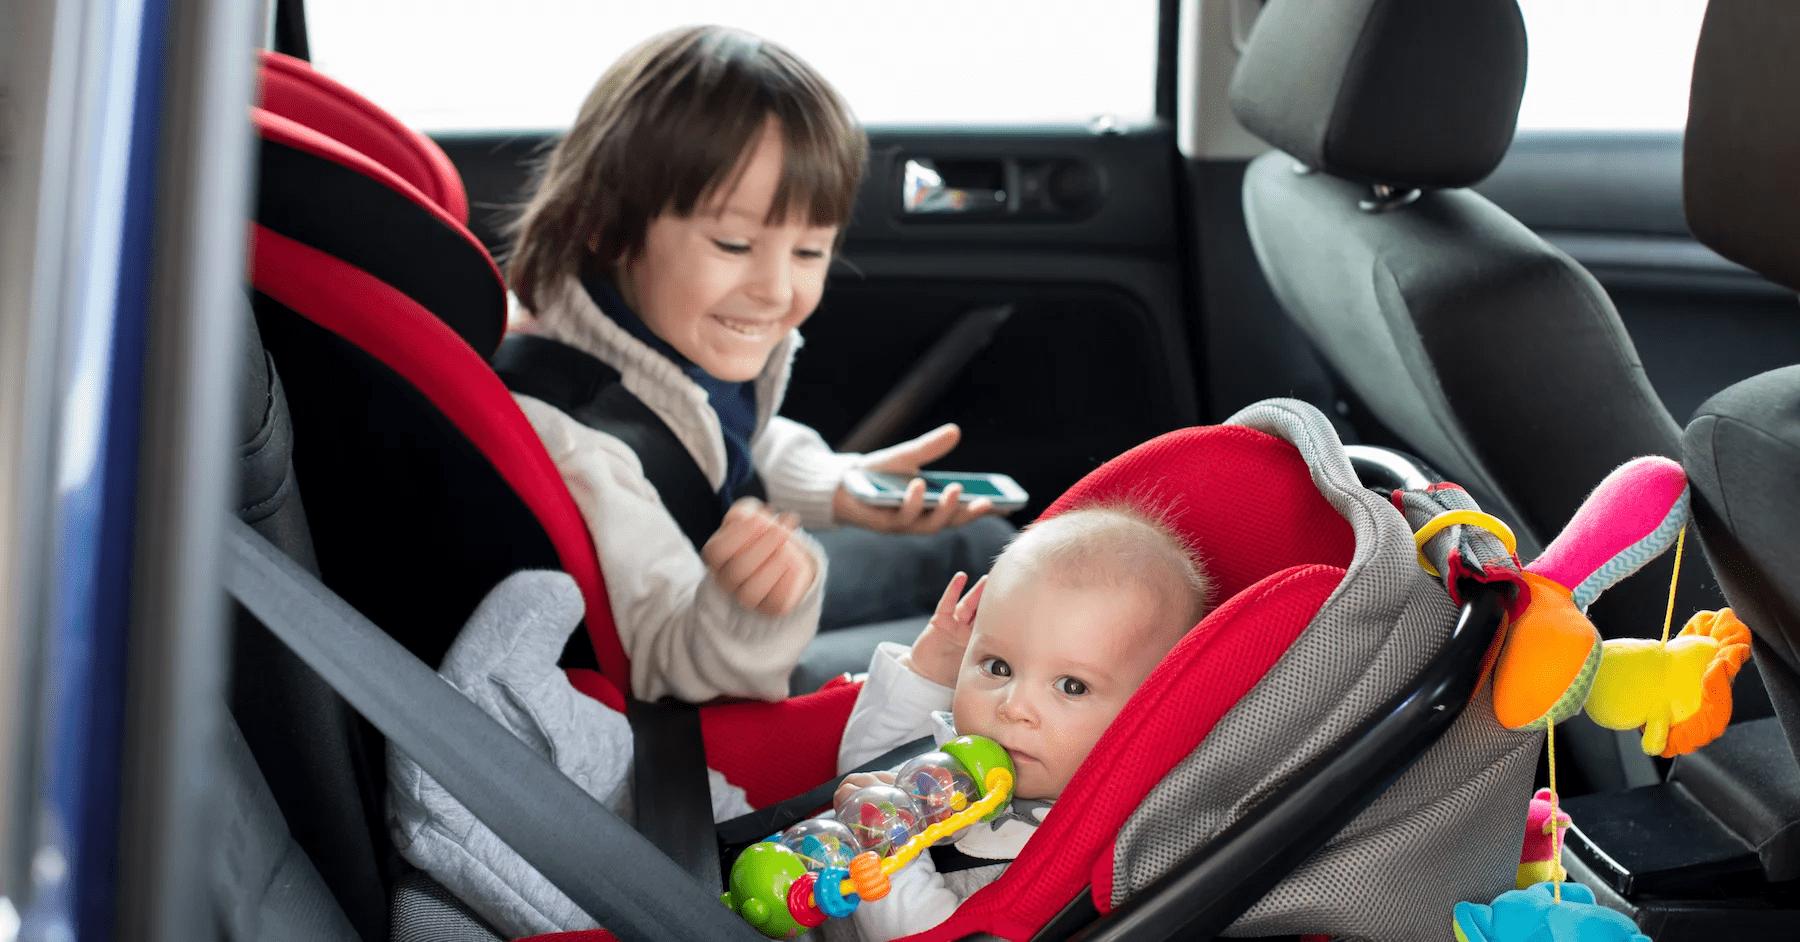 When Do Infant Car Seats Expire?